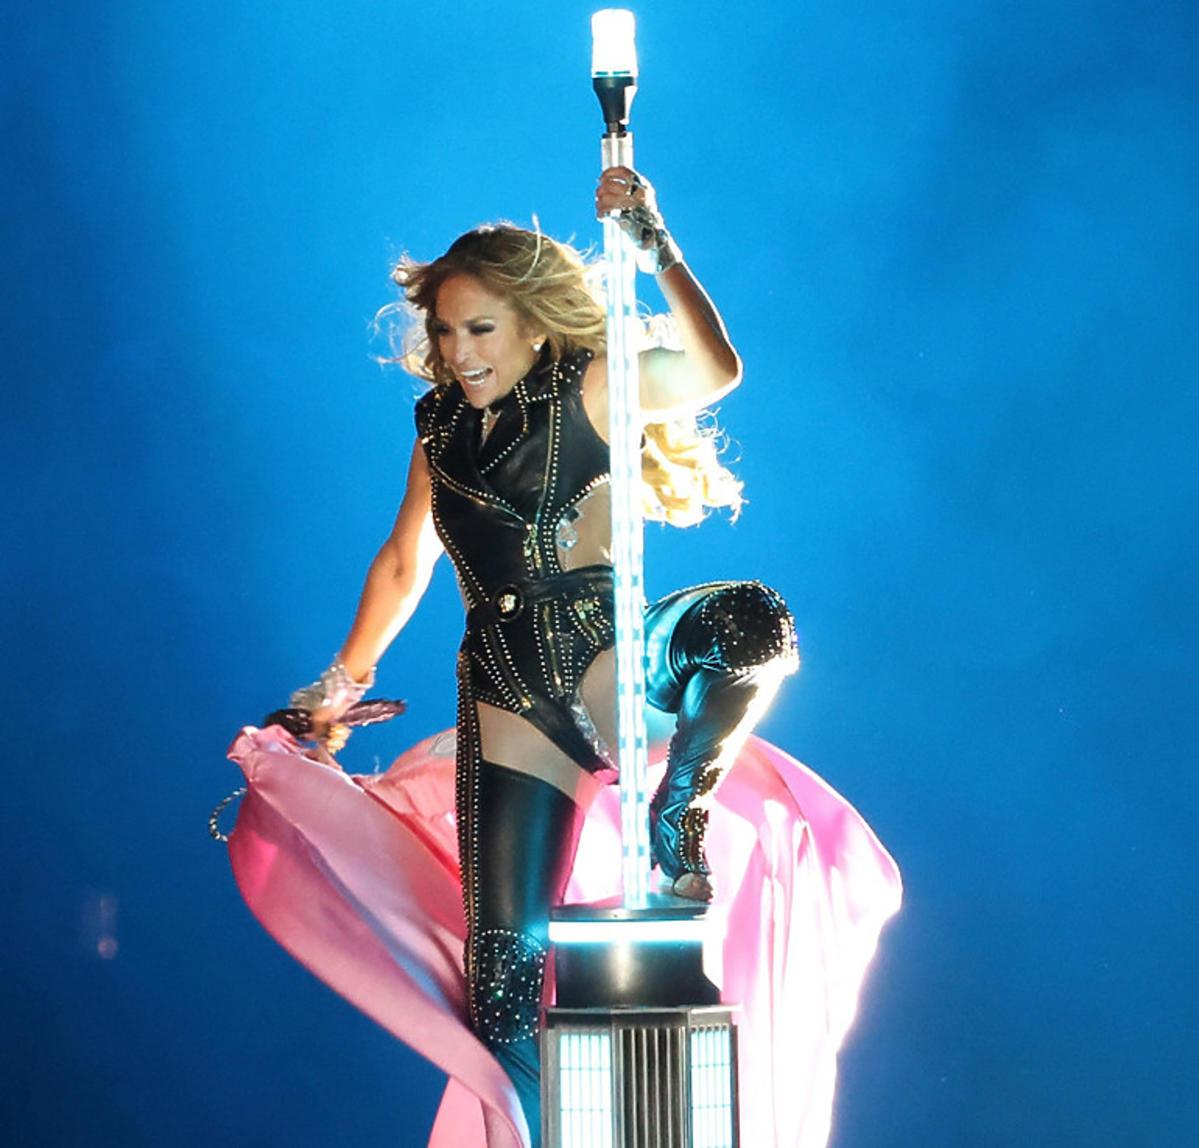 Występ Shakiry i Jennifer Lopez na Super Bowl 2020